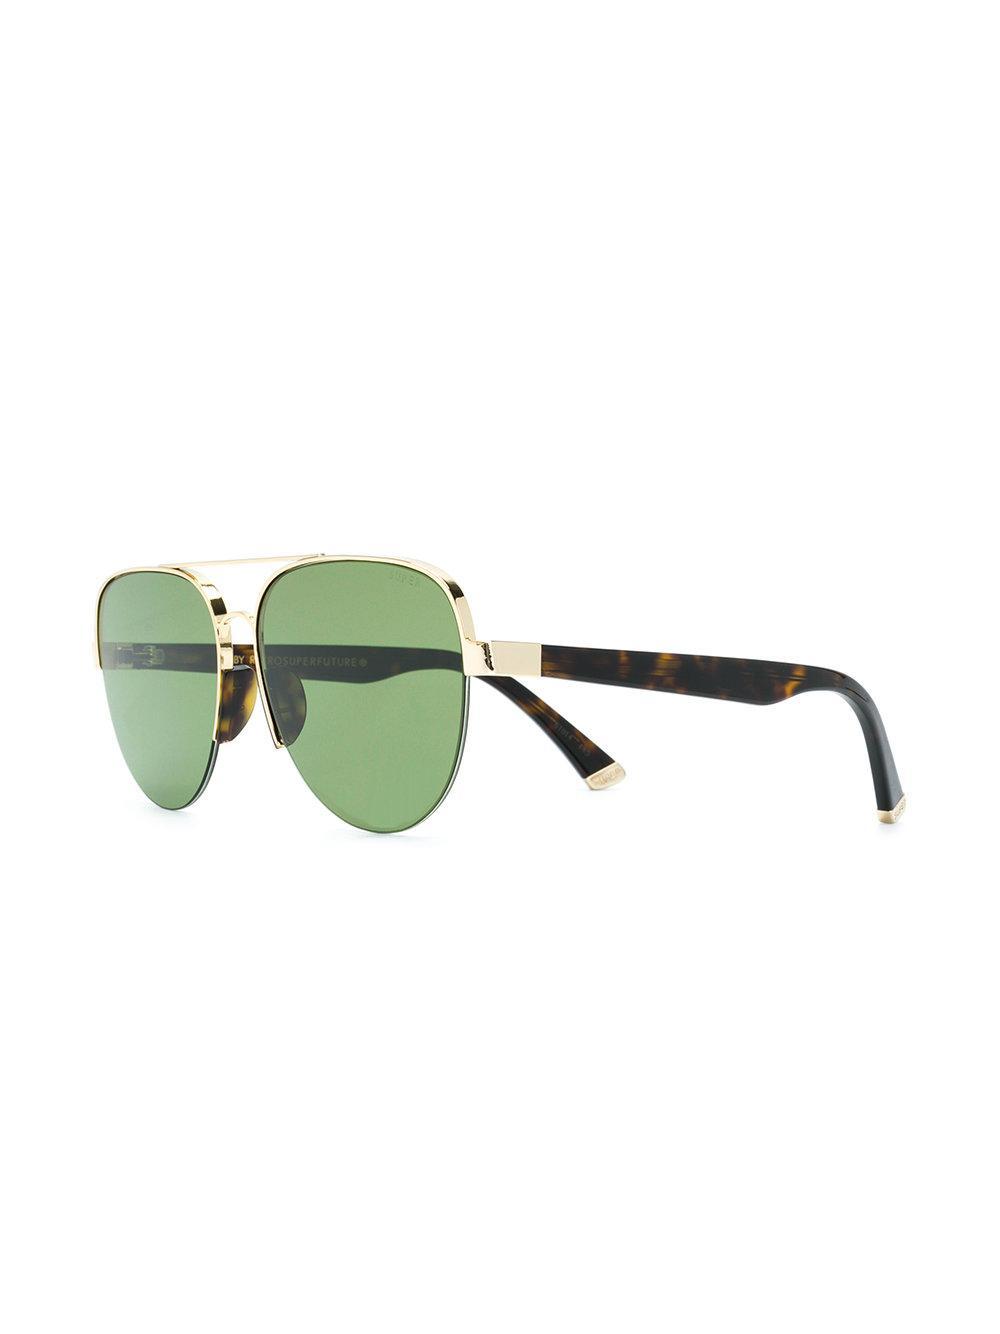 Sunglasses Retrosuperfuture Air Retrosuperfuture Air Retrosuperfuture Sunglasses Air Retrosuperfuture Sunglasses qAwXPAUrg